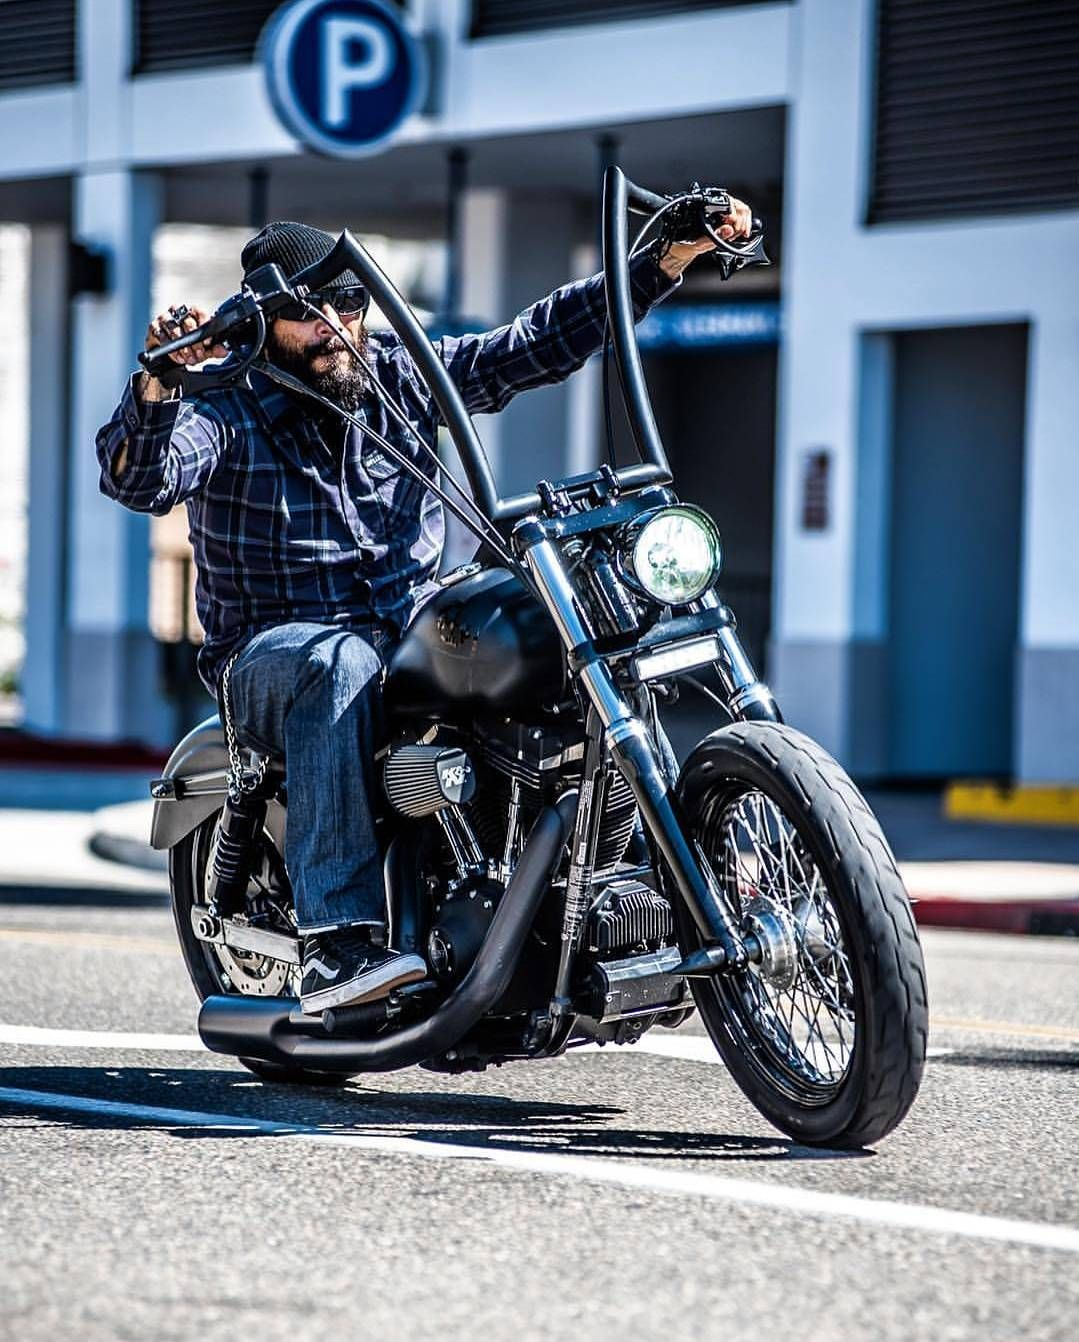 Harleydavidson Harley Bikers Riders Motorcycle Motorbike Hd Chopper Bobber Harleybstyle Dyna S Harley Davidson Bikes Harley Bikes Motorcycle Harley